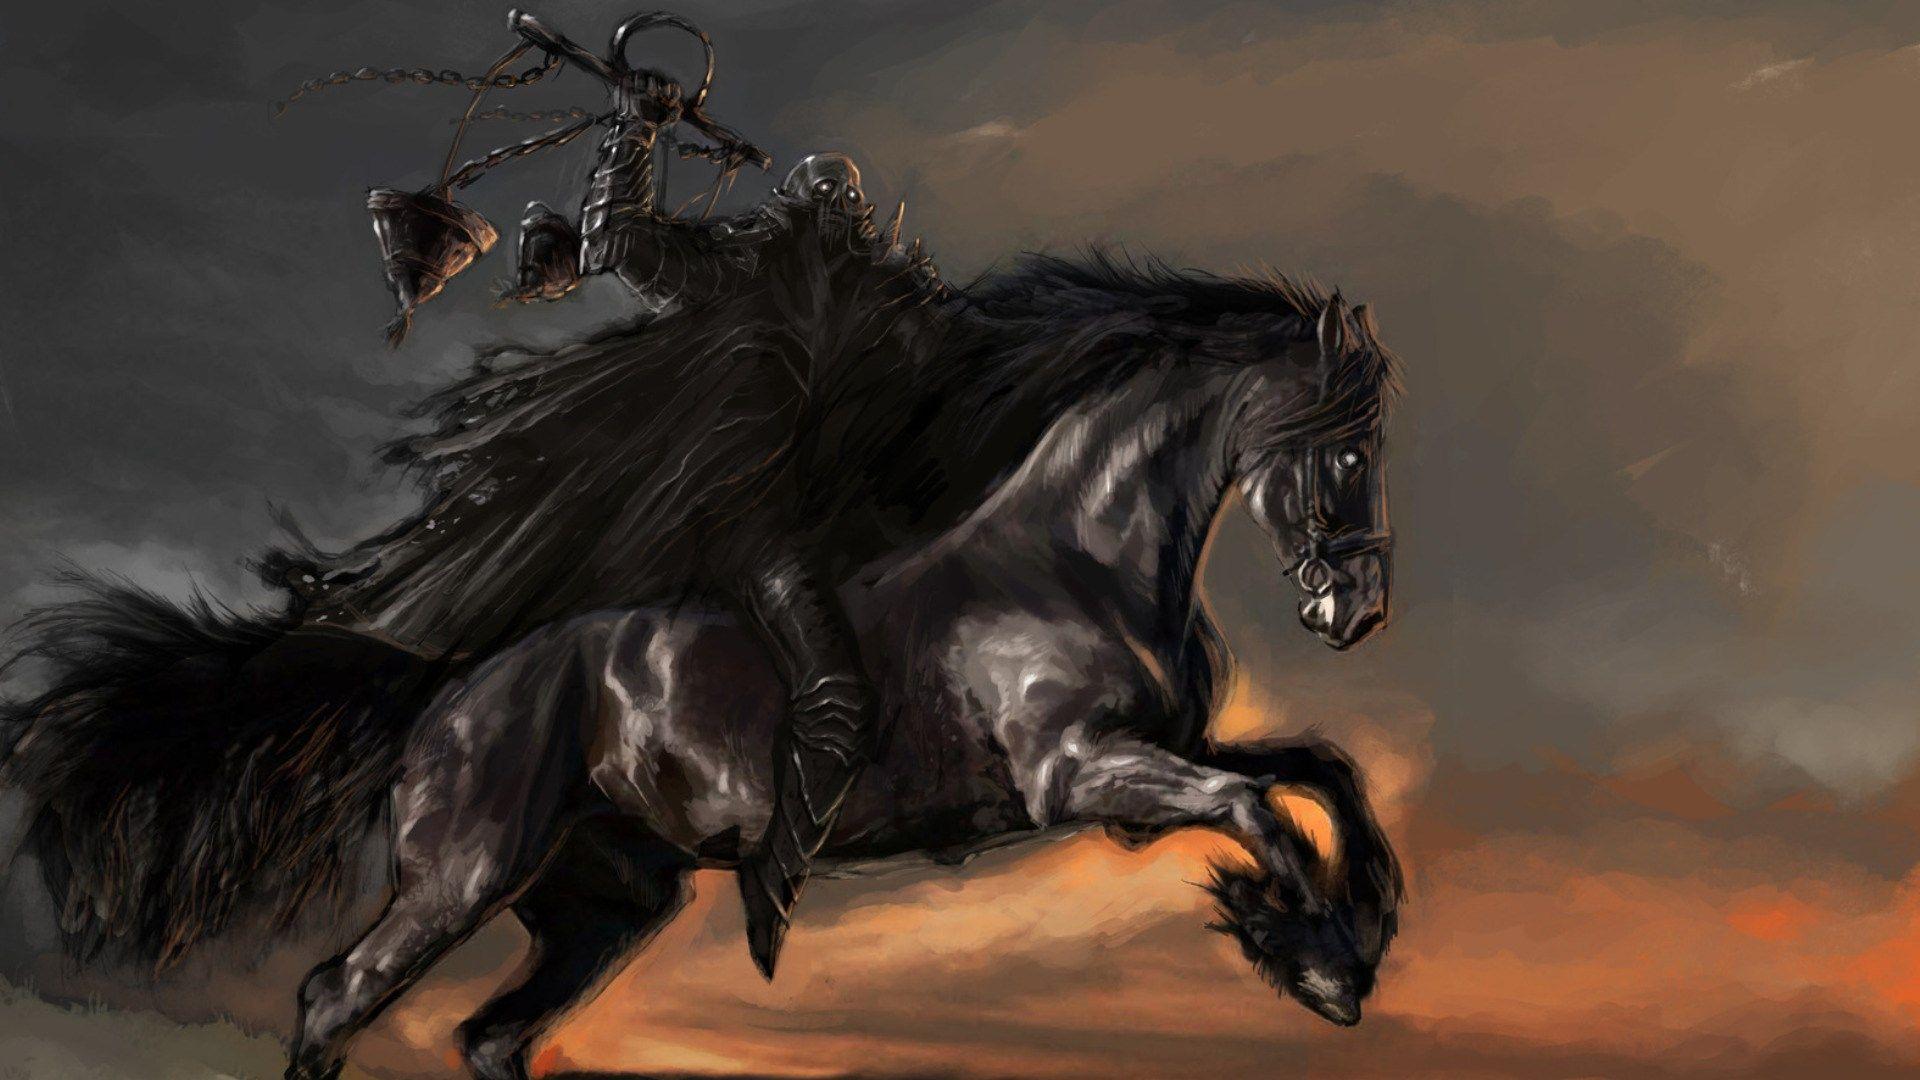 Simple Wallpaper Horse Warrior - cb16813266203c3a7761e7fa96f34fd9  Trends_6178100.jpg